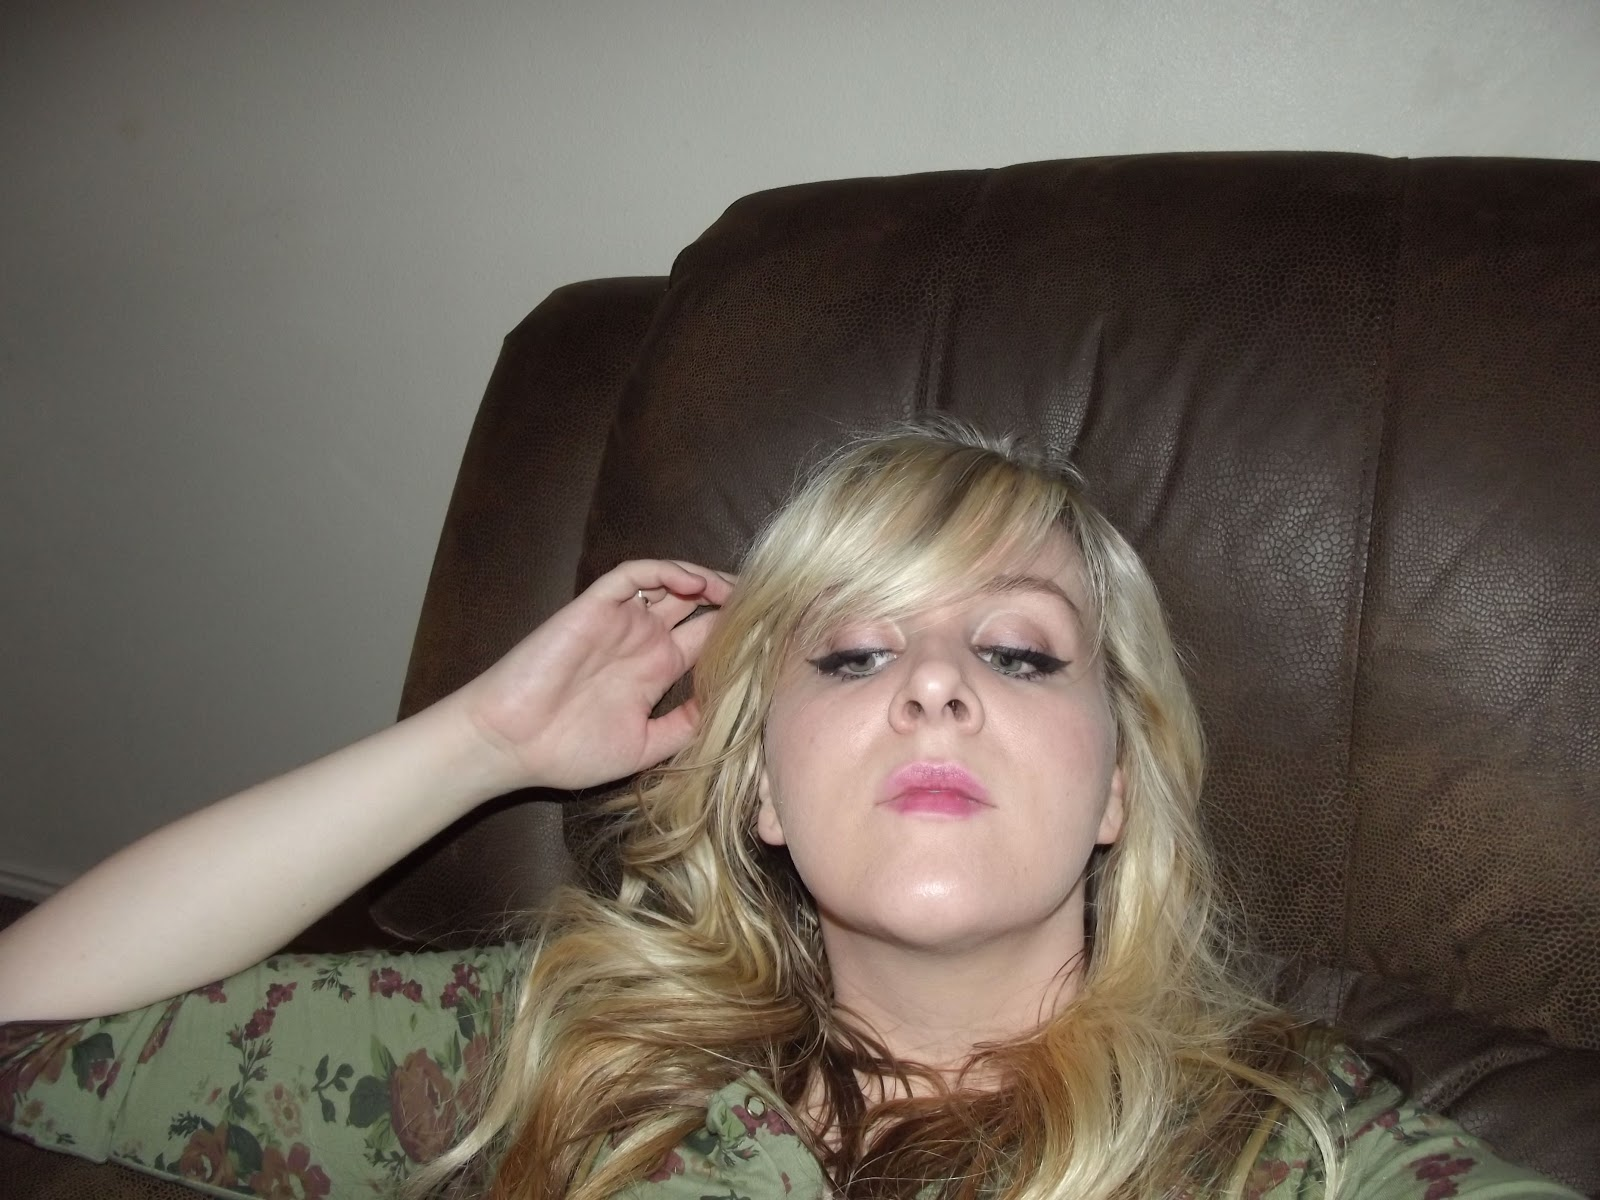 http://2.bp.blogspot.com/-Y0eyXAhvmv0/TyRlaPWEJfI/AAAAAAAAA0U/4U_LHvNU6xM/s1600/DSCF0047.JPG